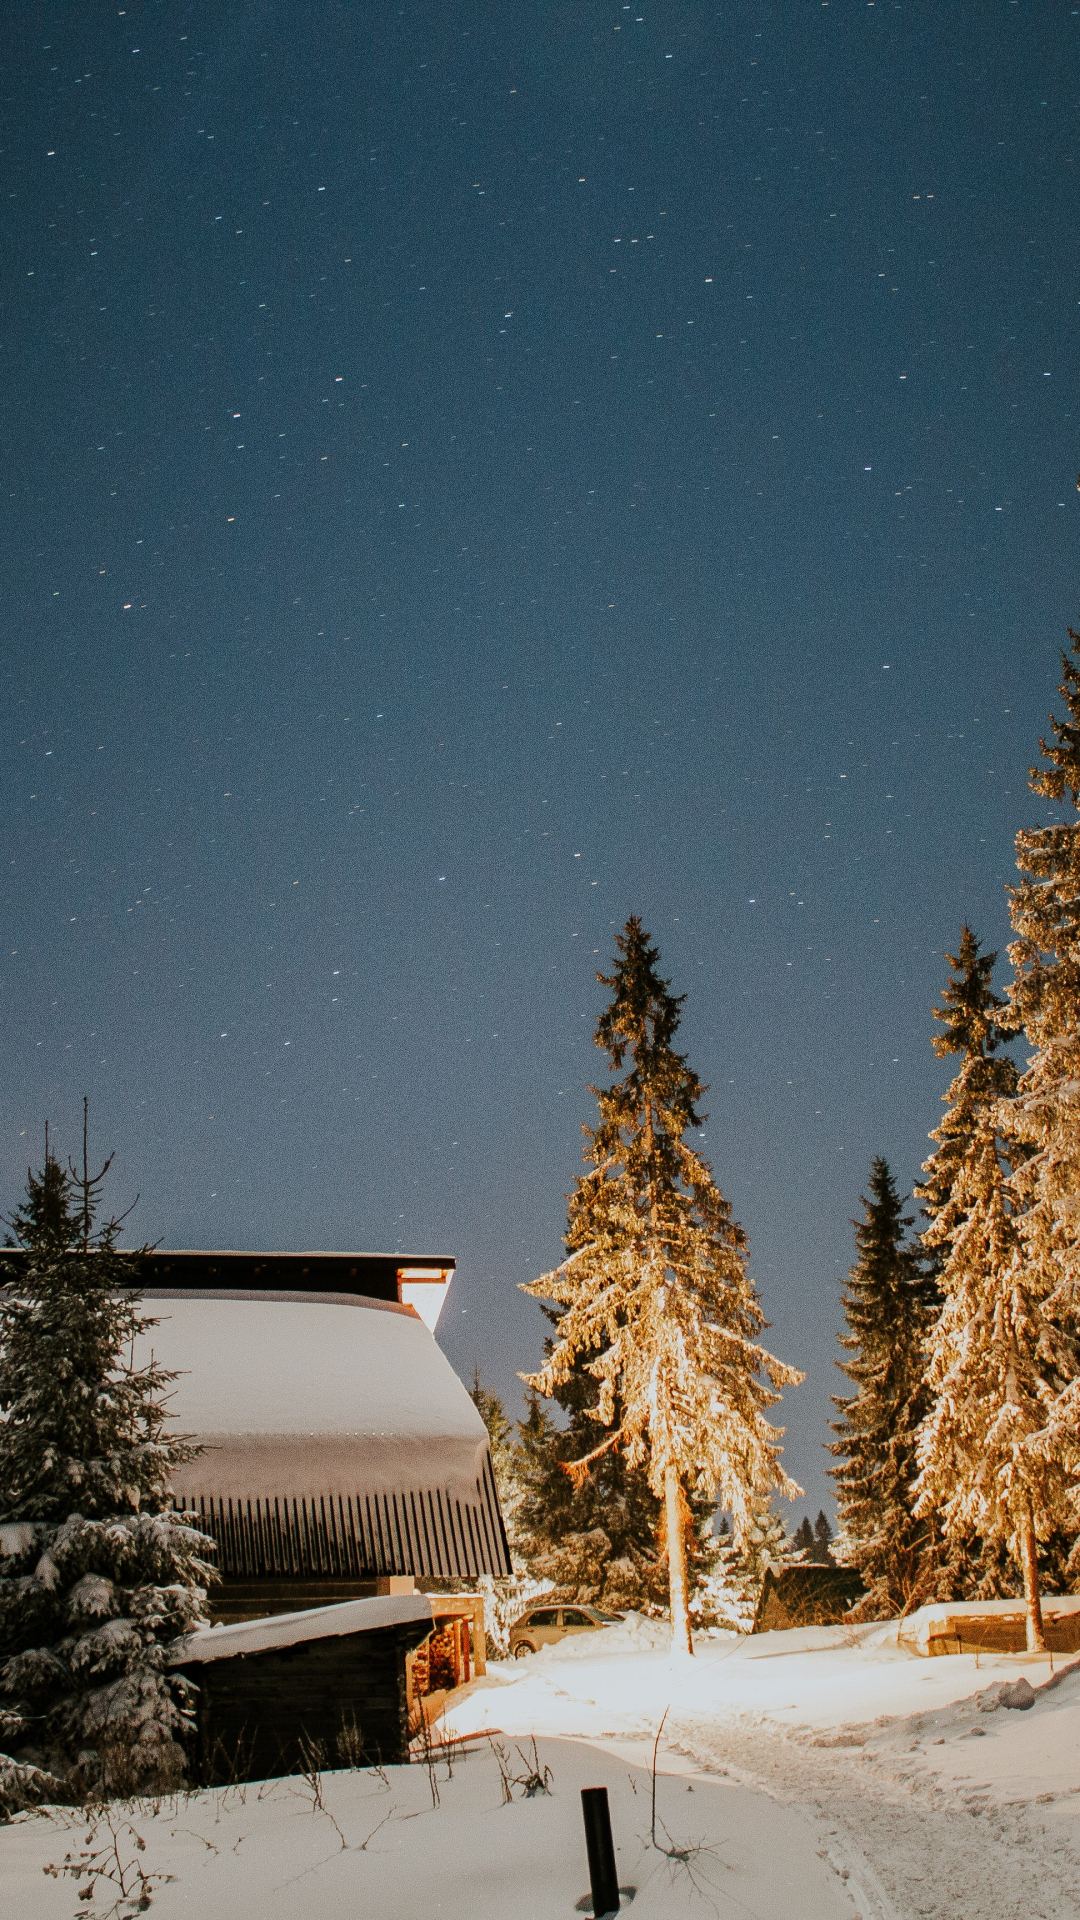 Cabin In The Wilderness Iphone Wallpaper Idrop News